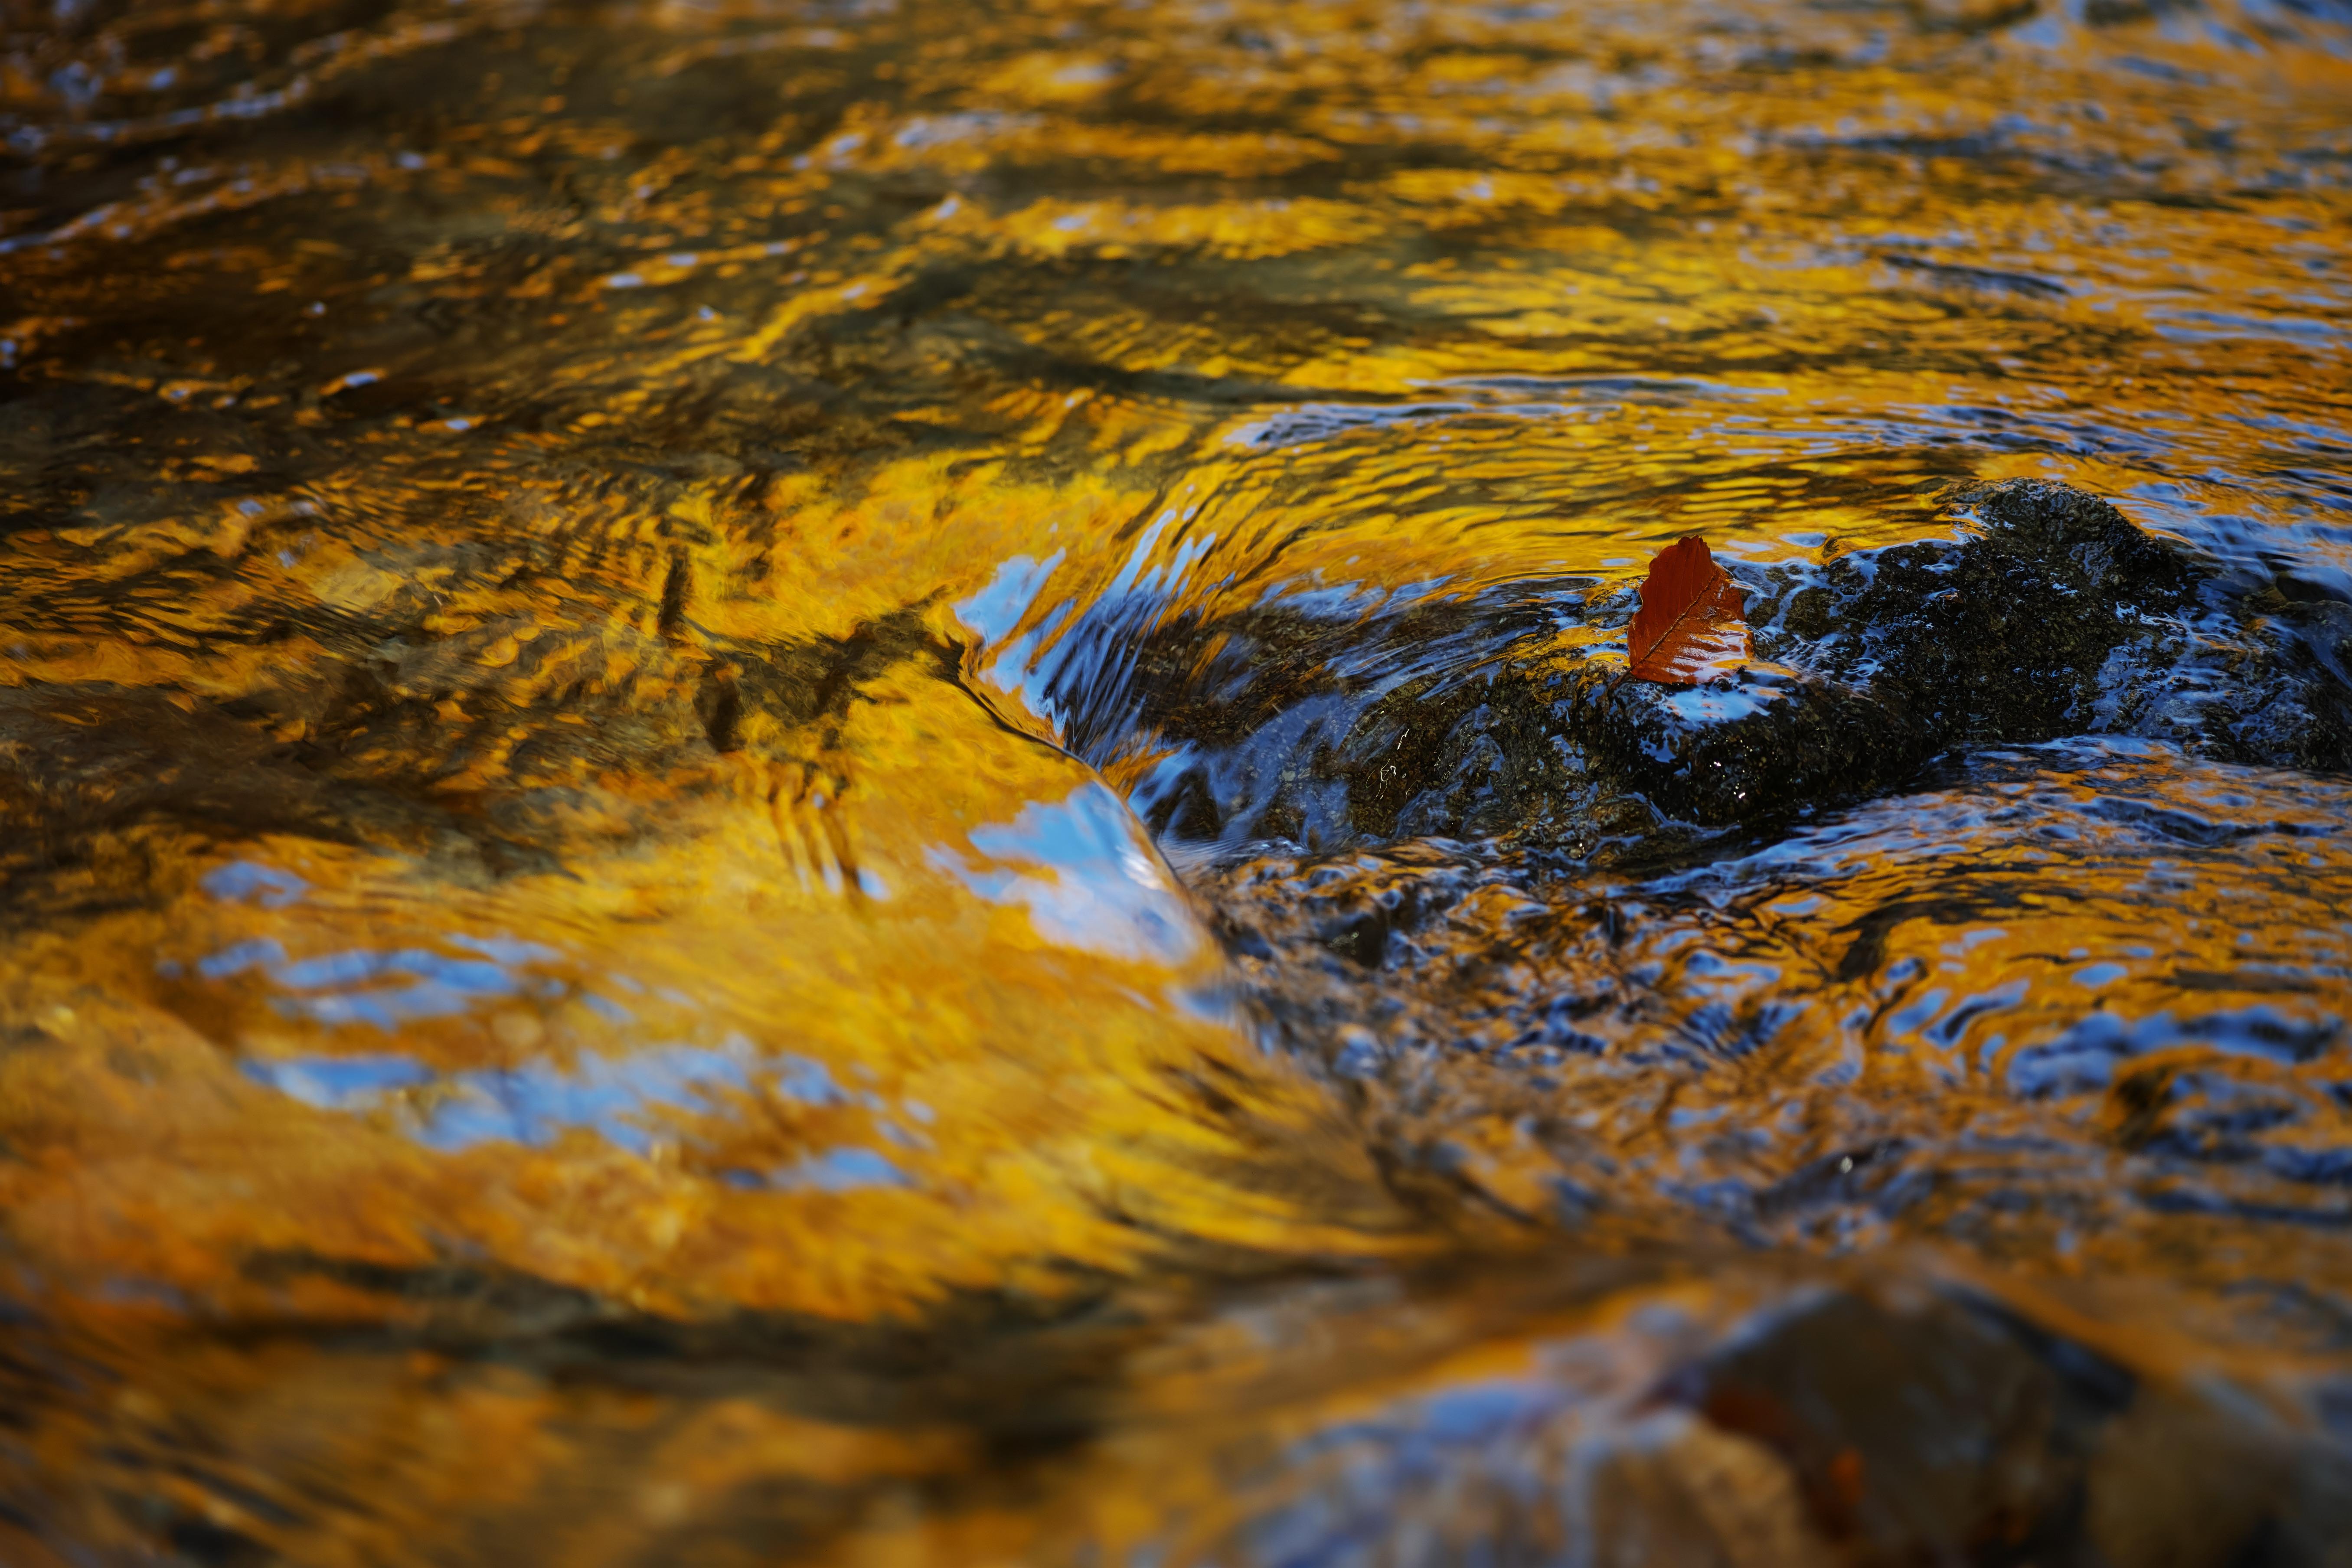 秋流(Autumn flow